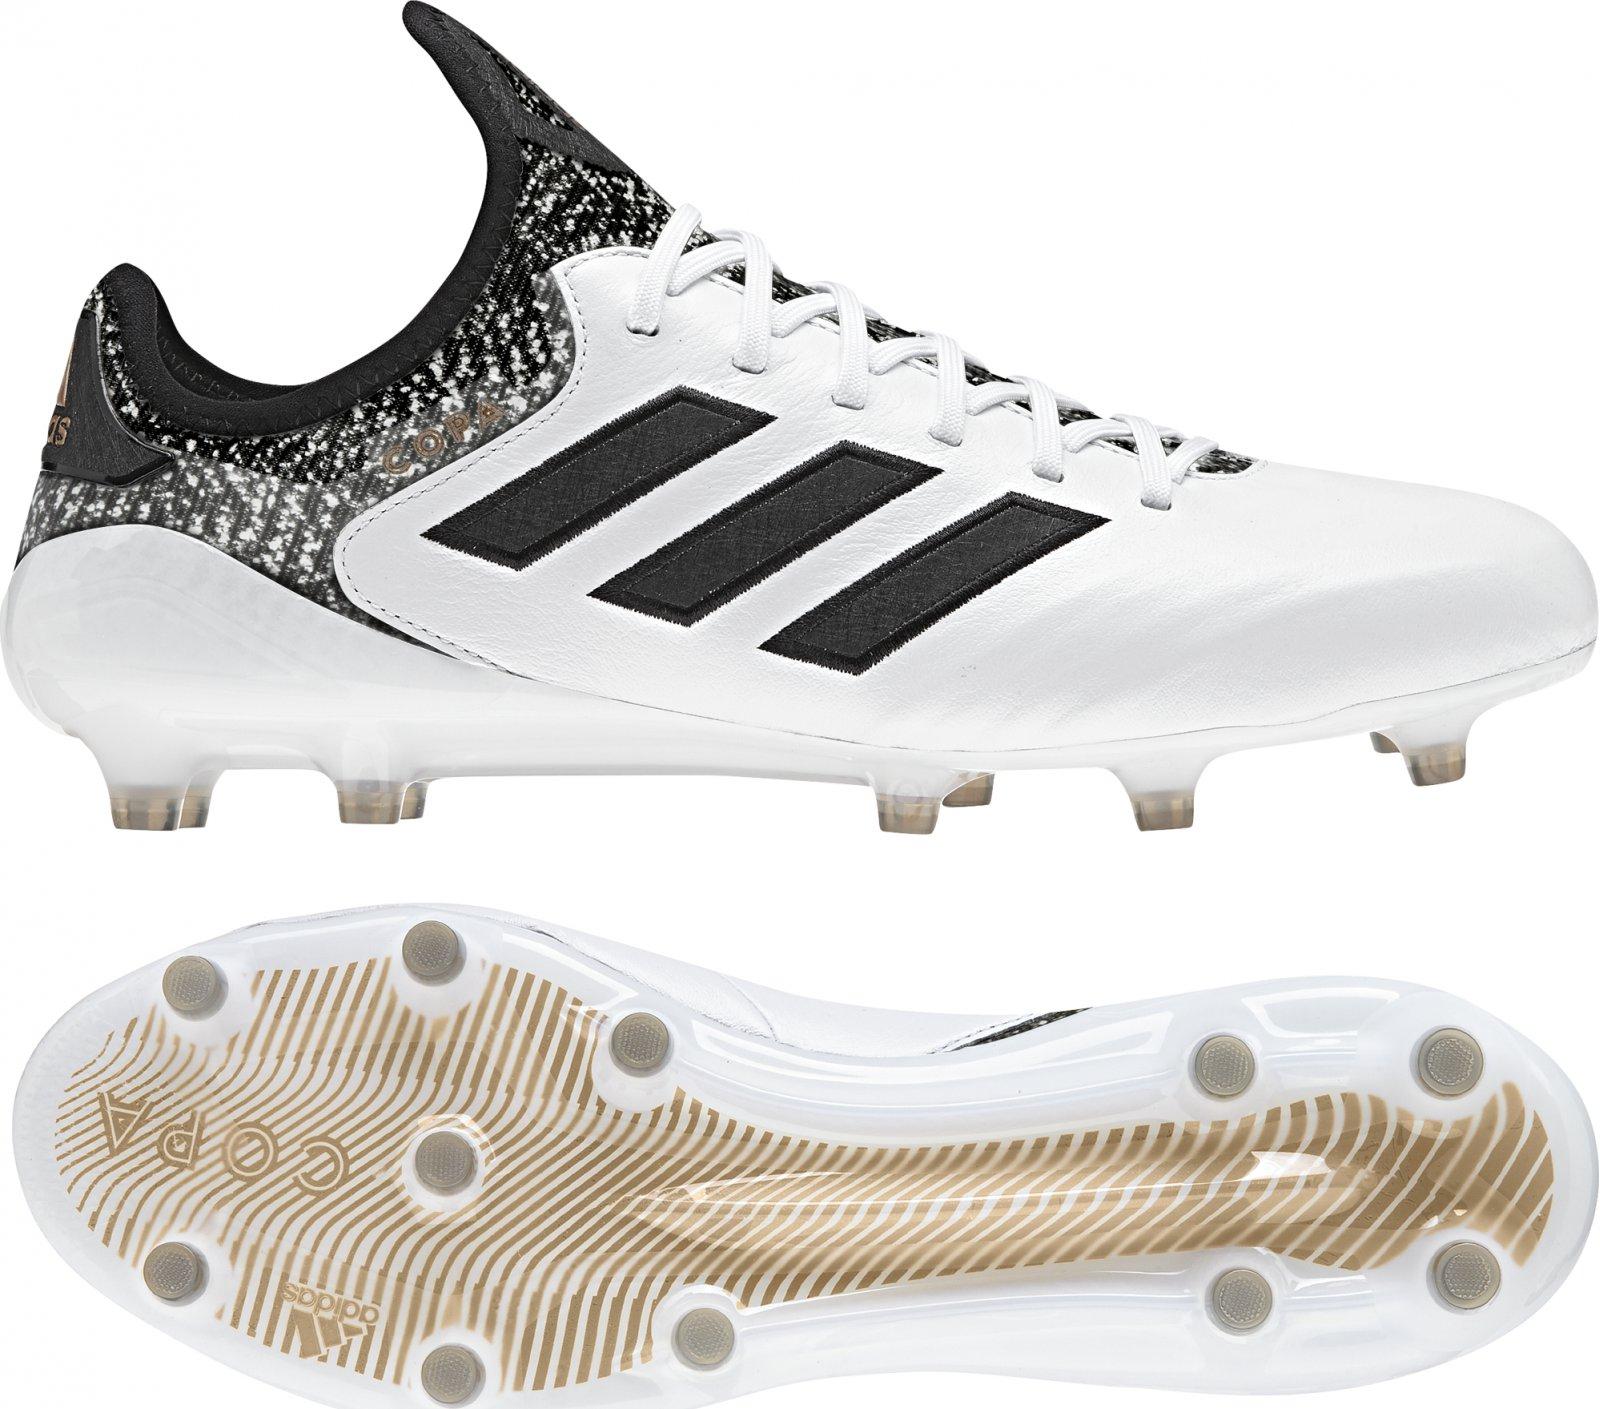 Adidas Copa 18.1 FG bílé/černé | Zboží.cz